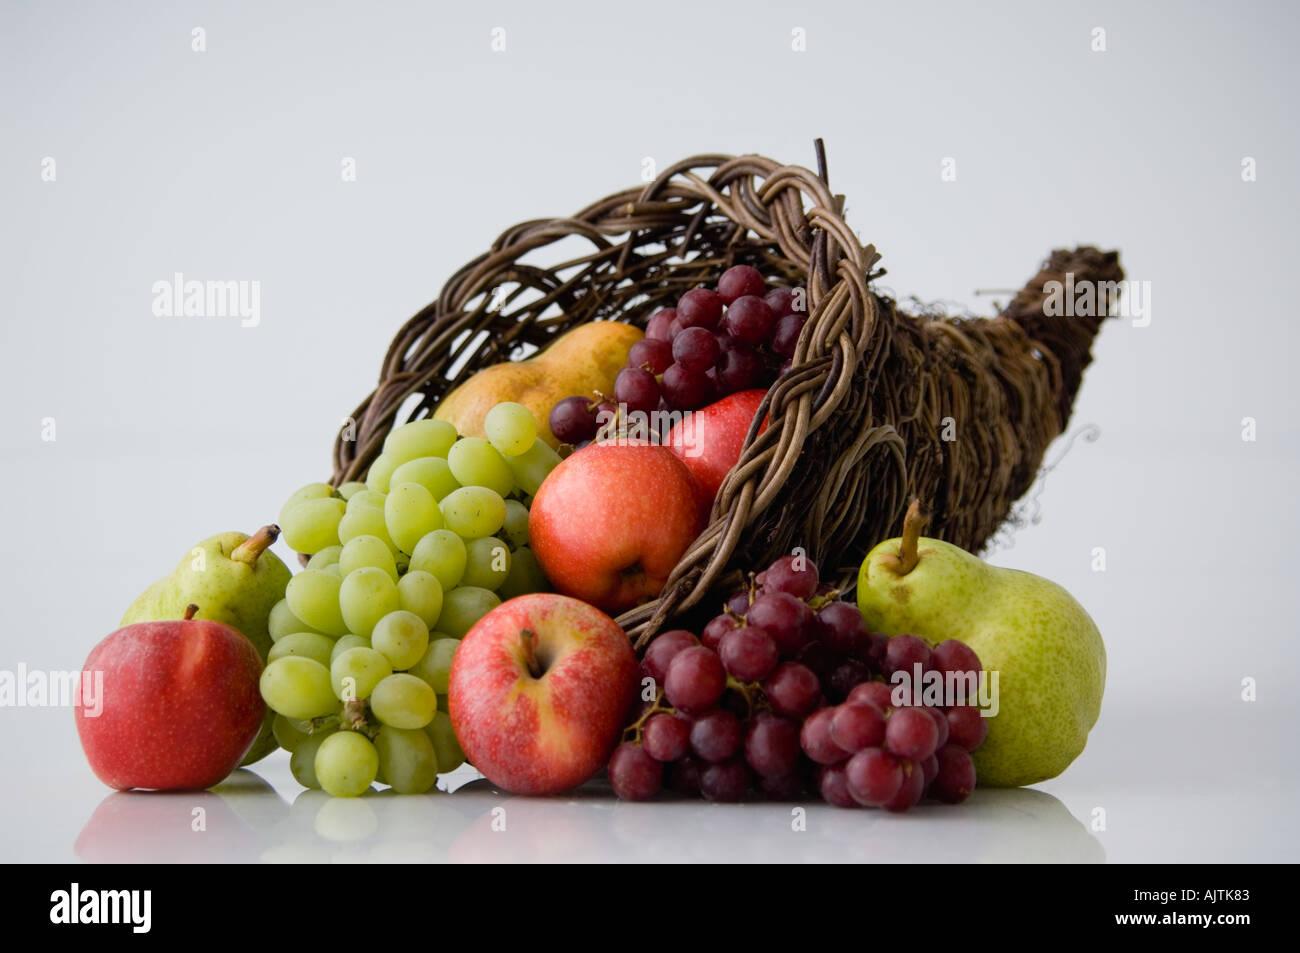 Cornucopia of fruit - Stock Image